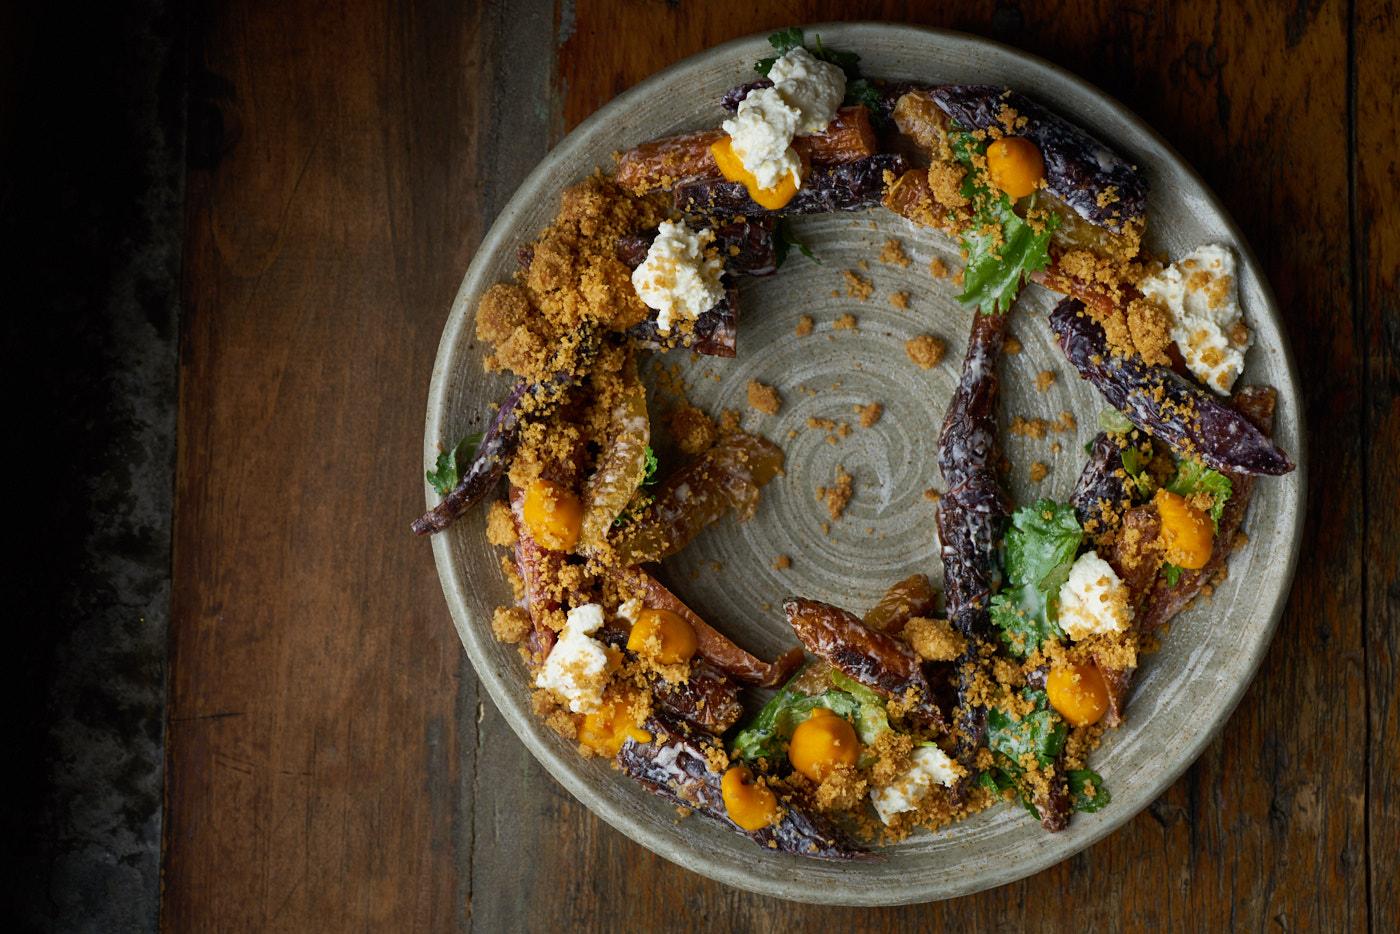 vegitables-plate-Mimi-la-Nuit, editorial food photography by Montreal food photographer Vadim Daniel